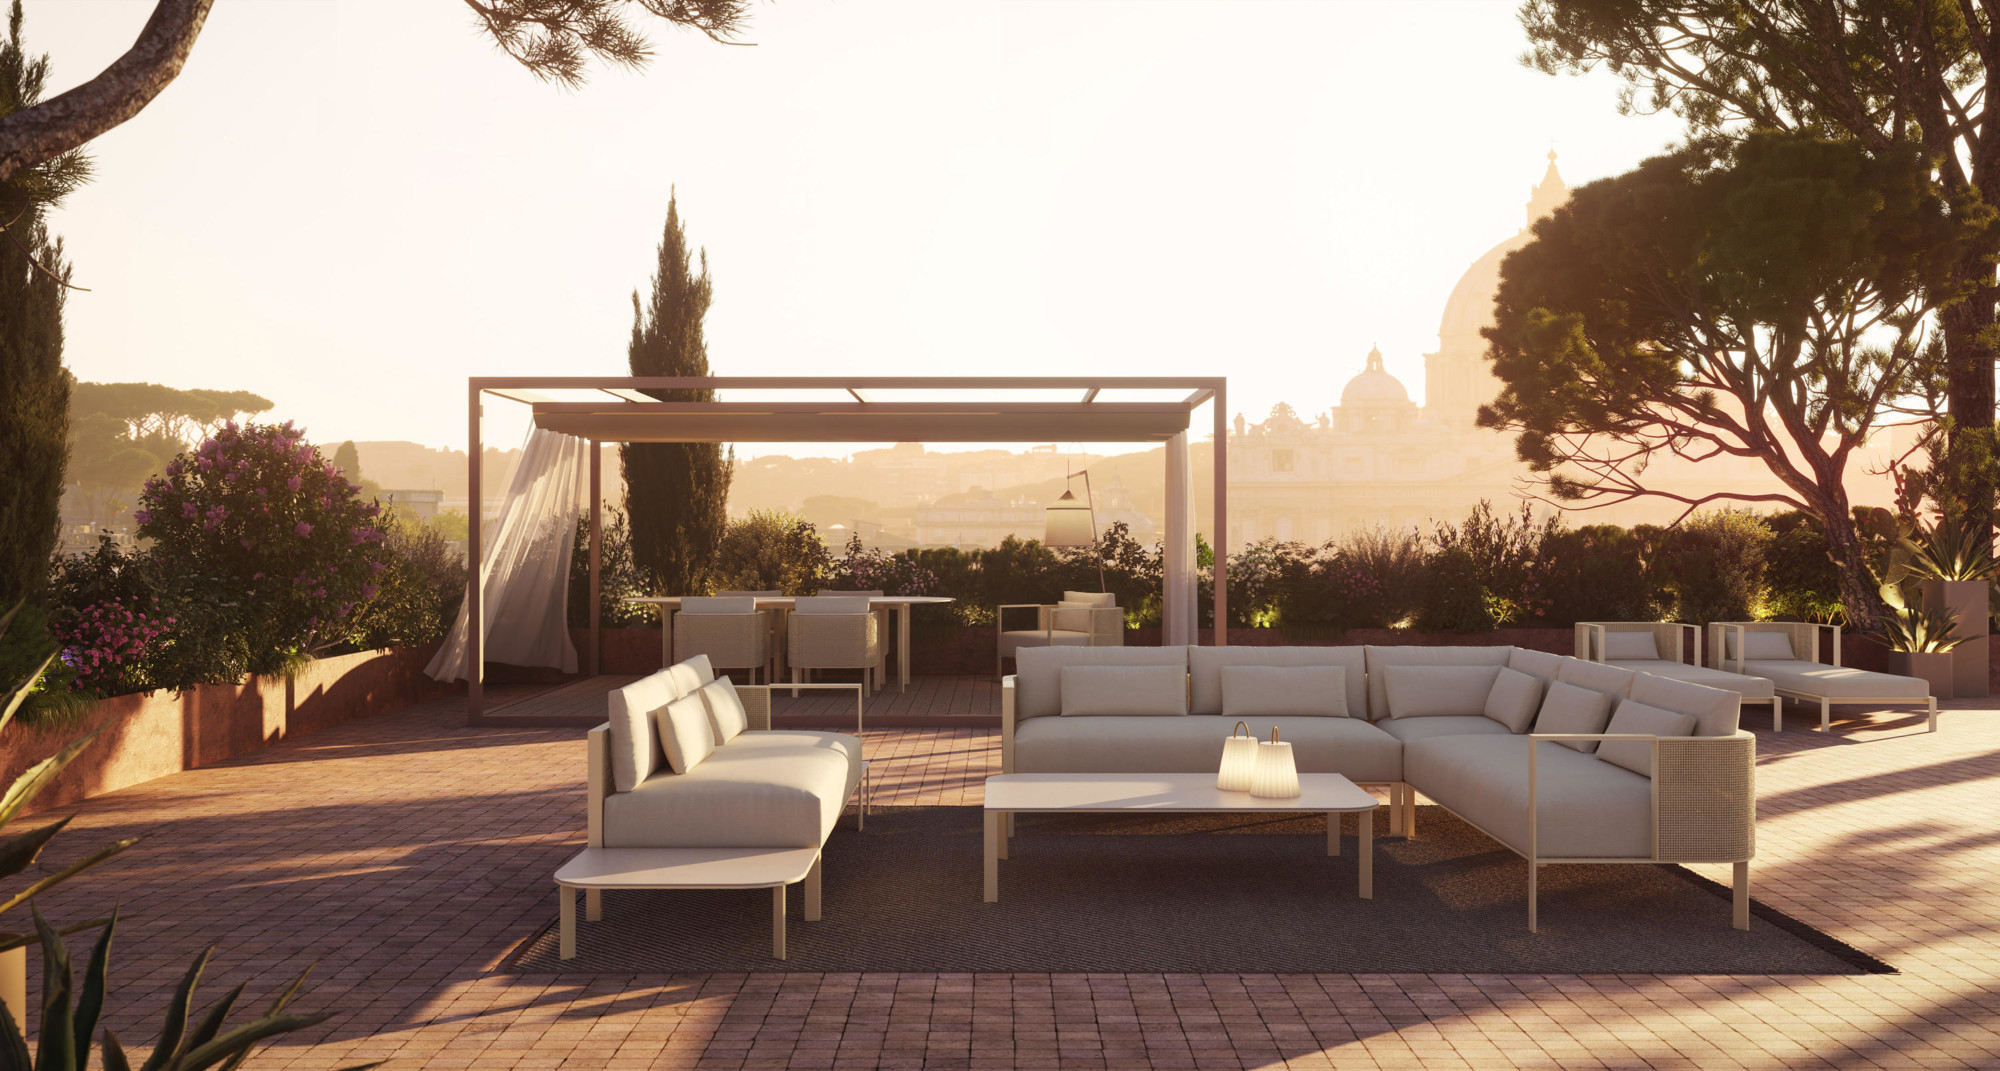 Gunni & Trentino nos trae las novedades en mobiliario de diseño para exteriores